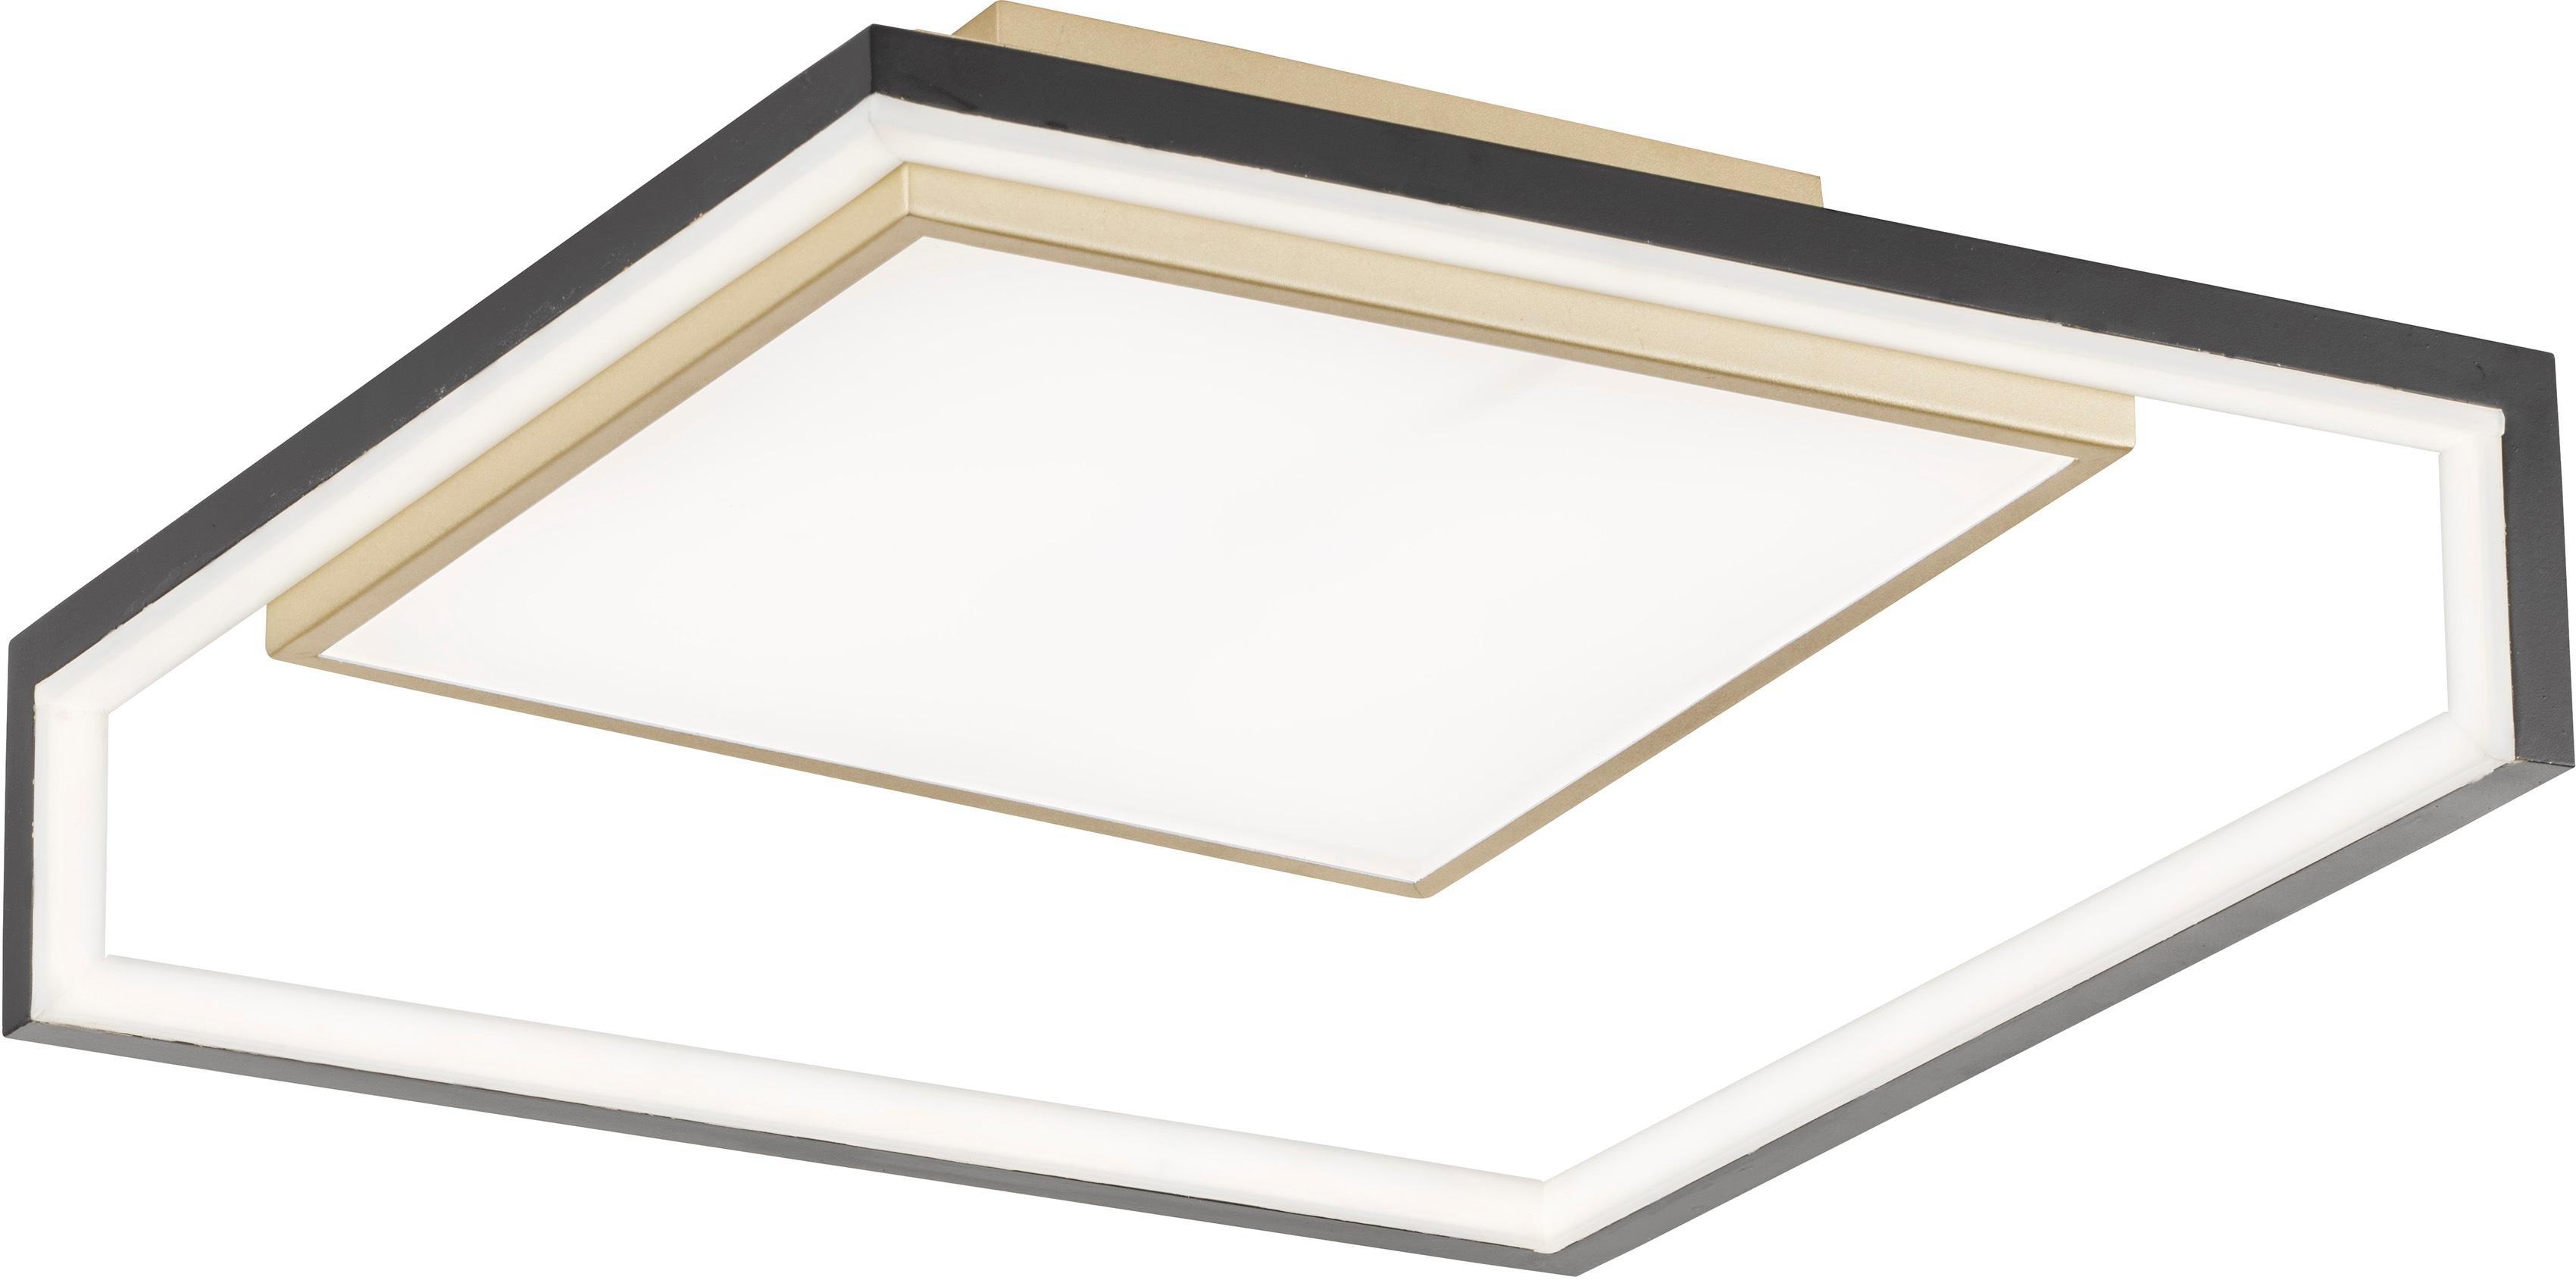 FISCHER & HONSEL LED Deckenleuchte Nala, LED-Board, 1 St., LED Deckenlampe